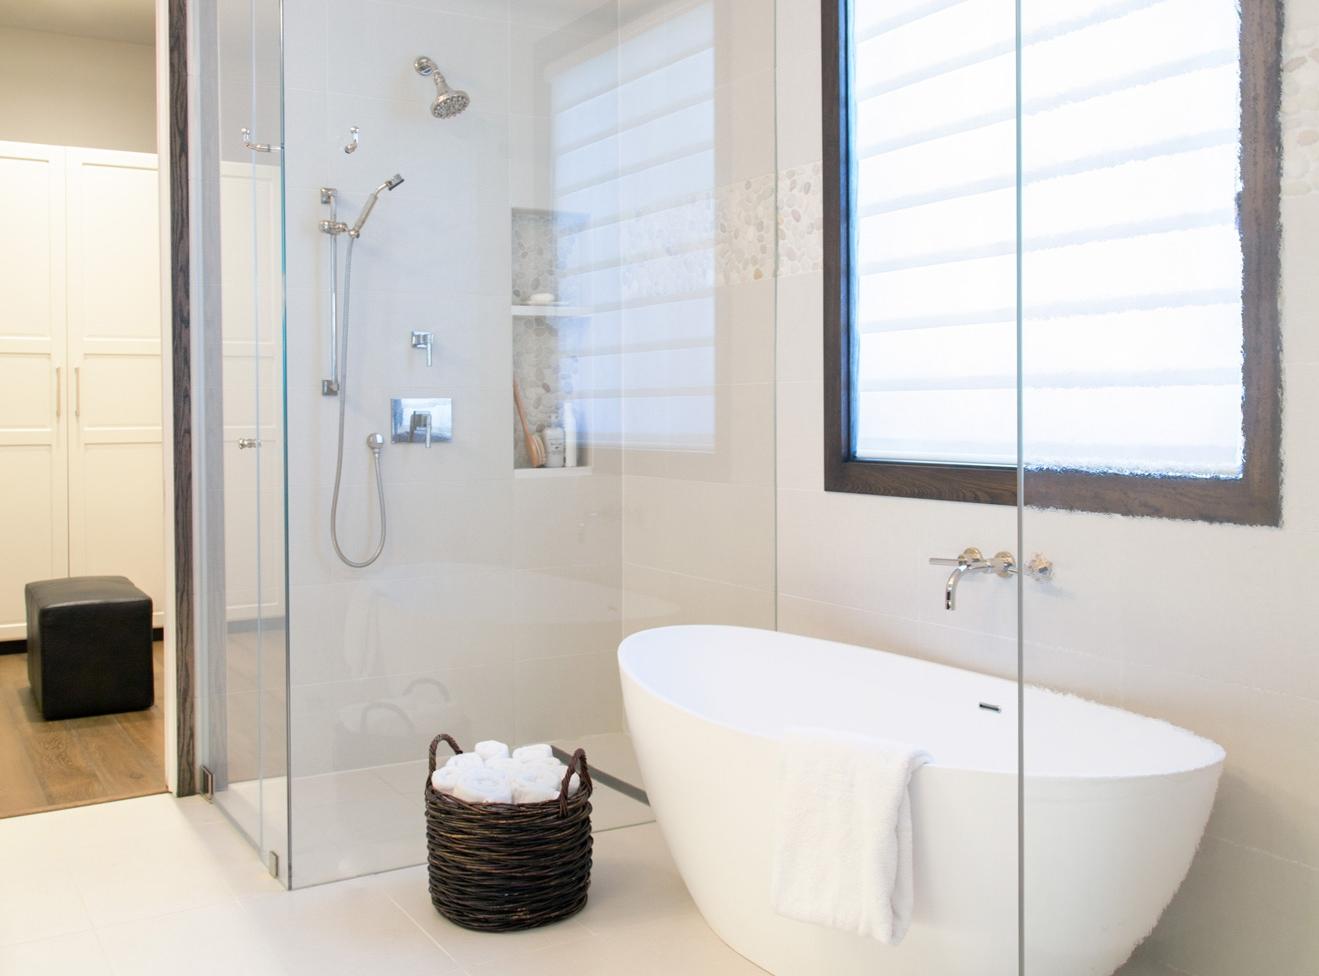 Master bathroom remodel; bathtub; shower | Interior Designer: Carla Aston / Photographer: Tori Aston